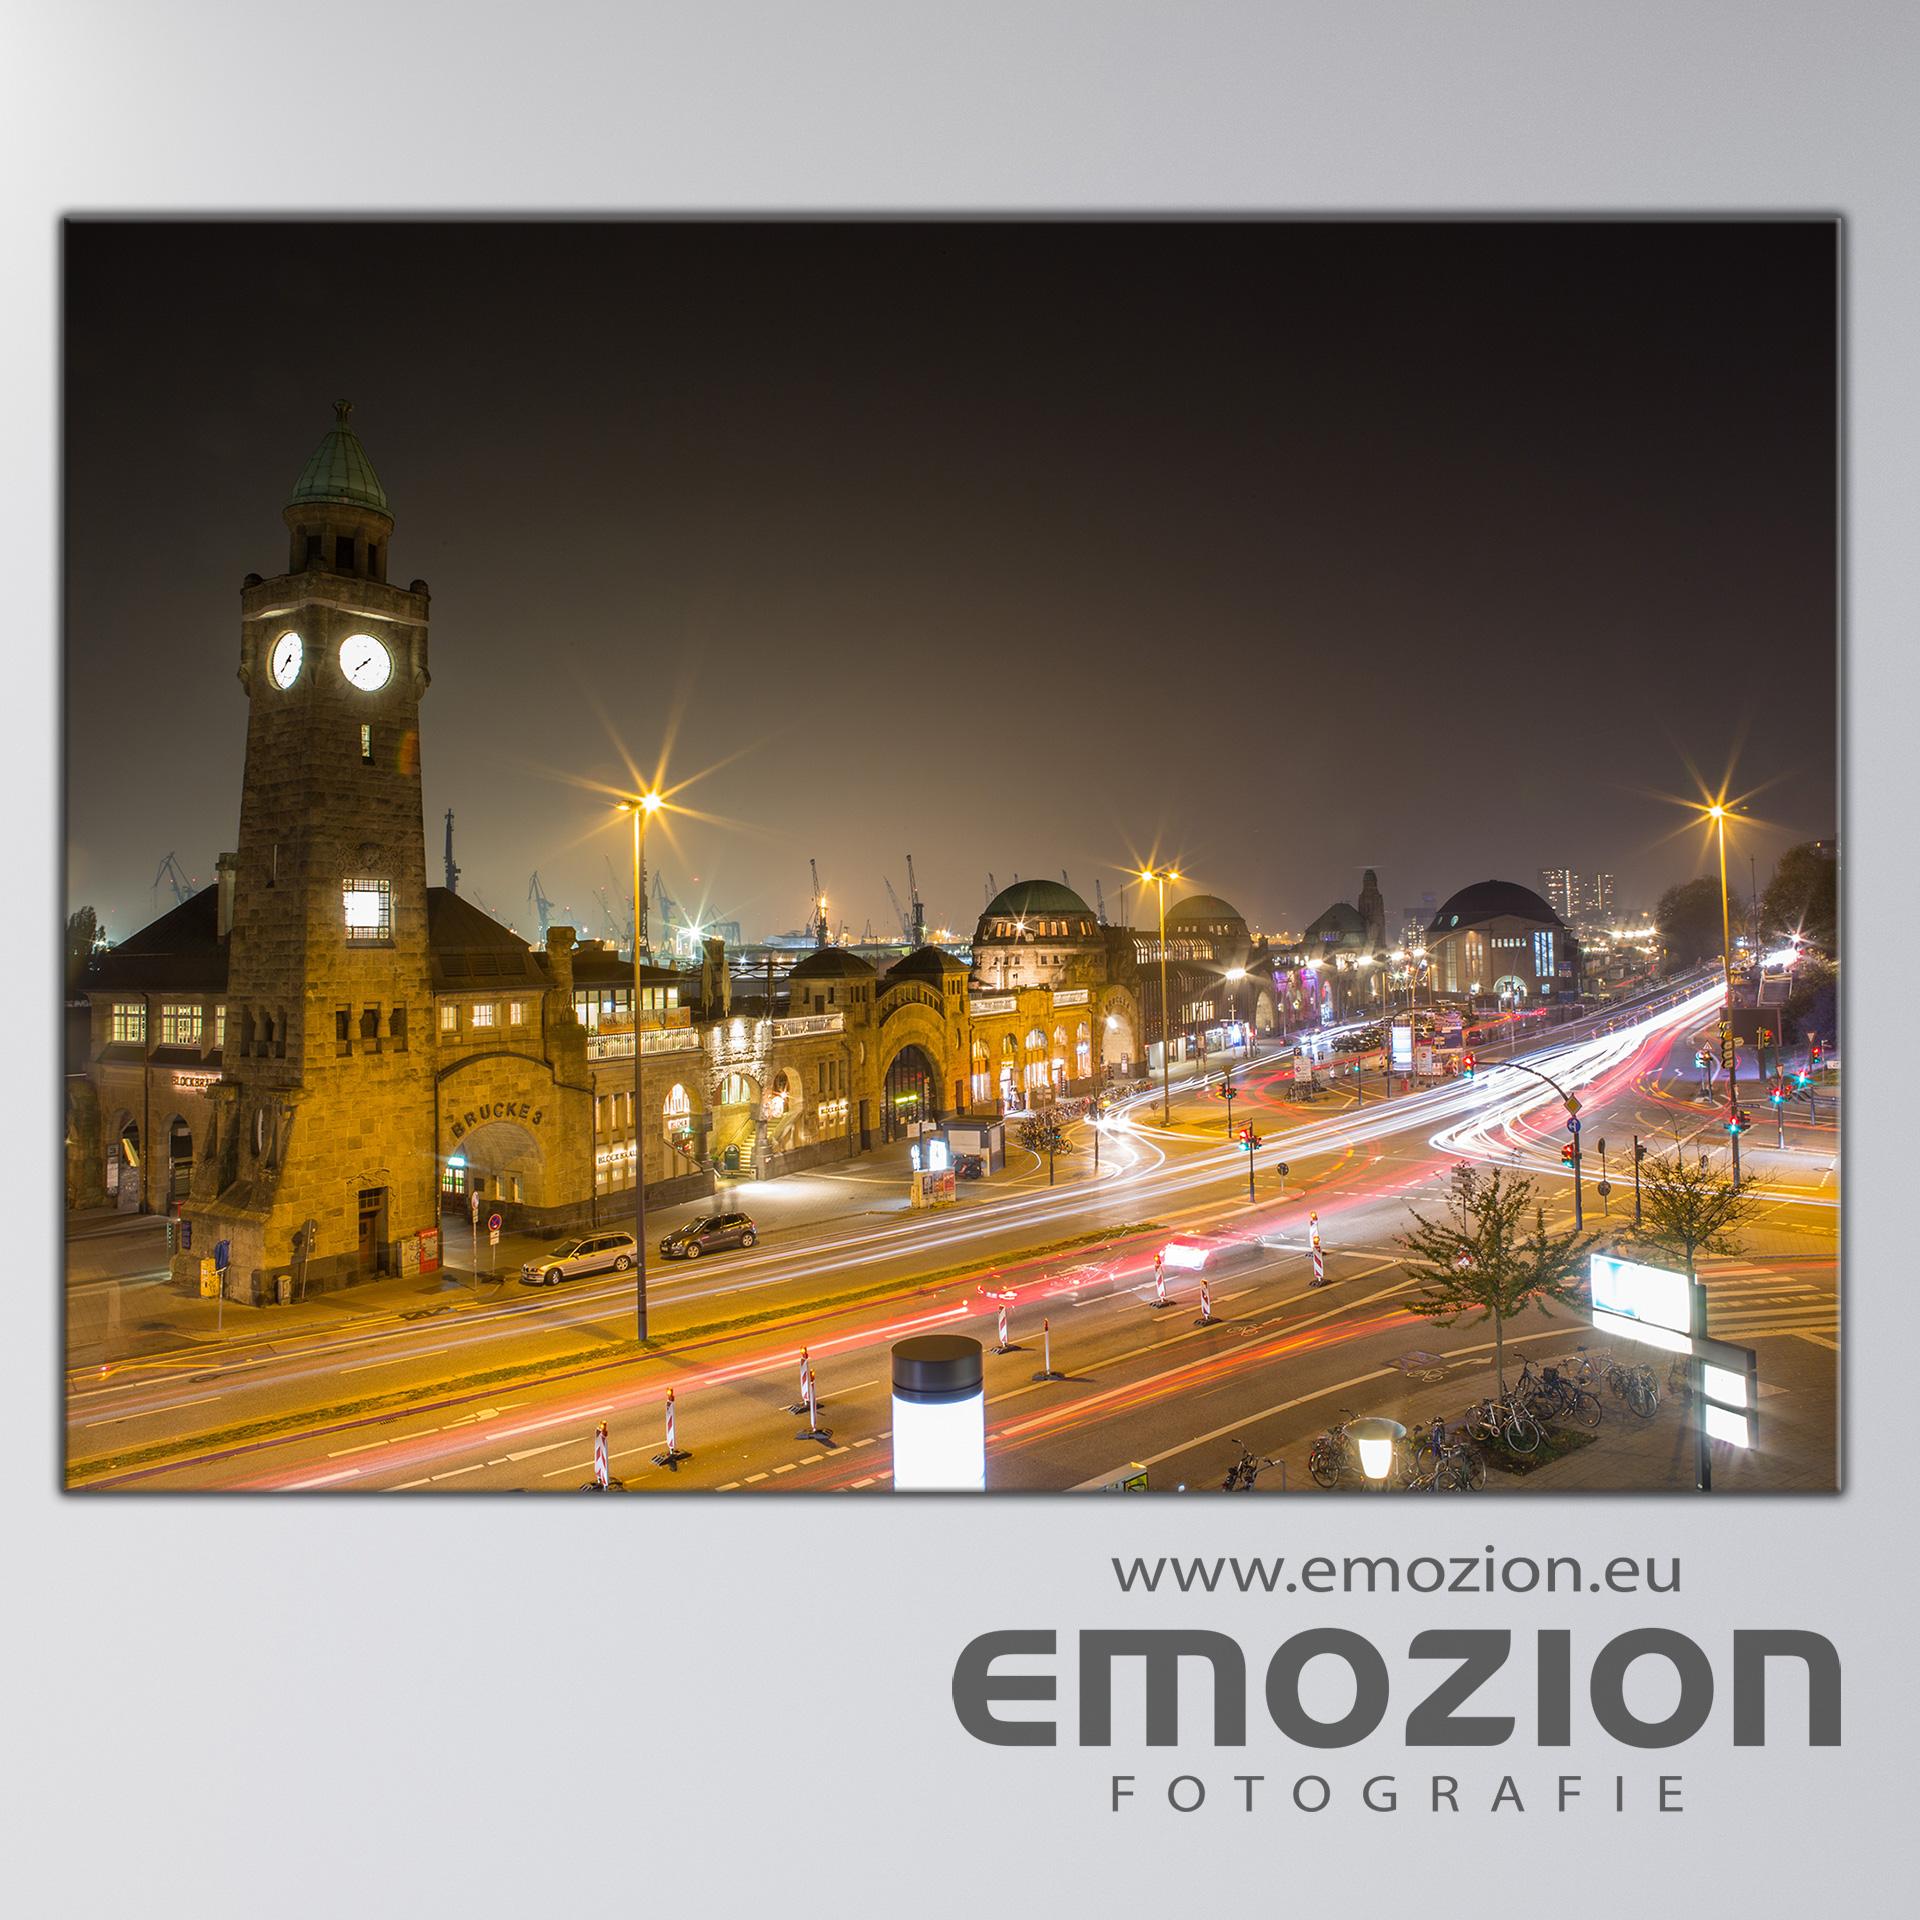 Leinwand-Bild - Motiv:Landungsbrücken Hamburg - EMOZION - Fotograf Sascha Block